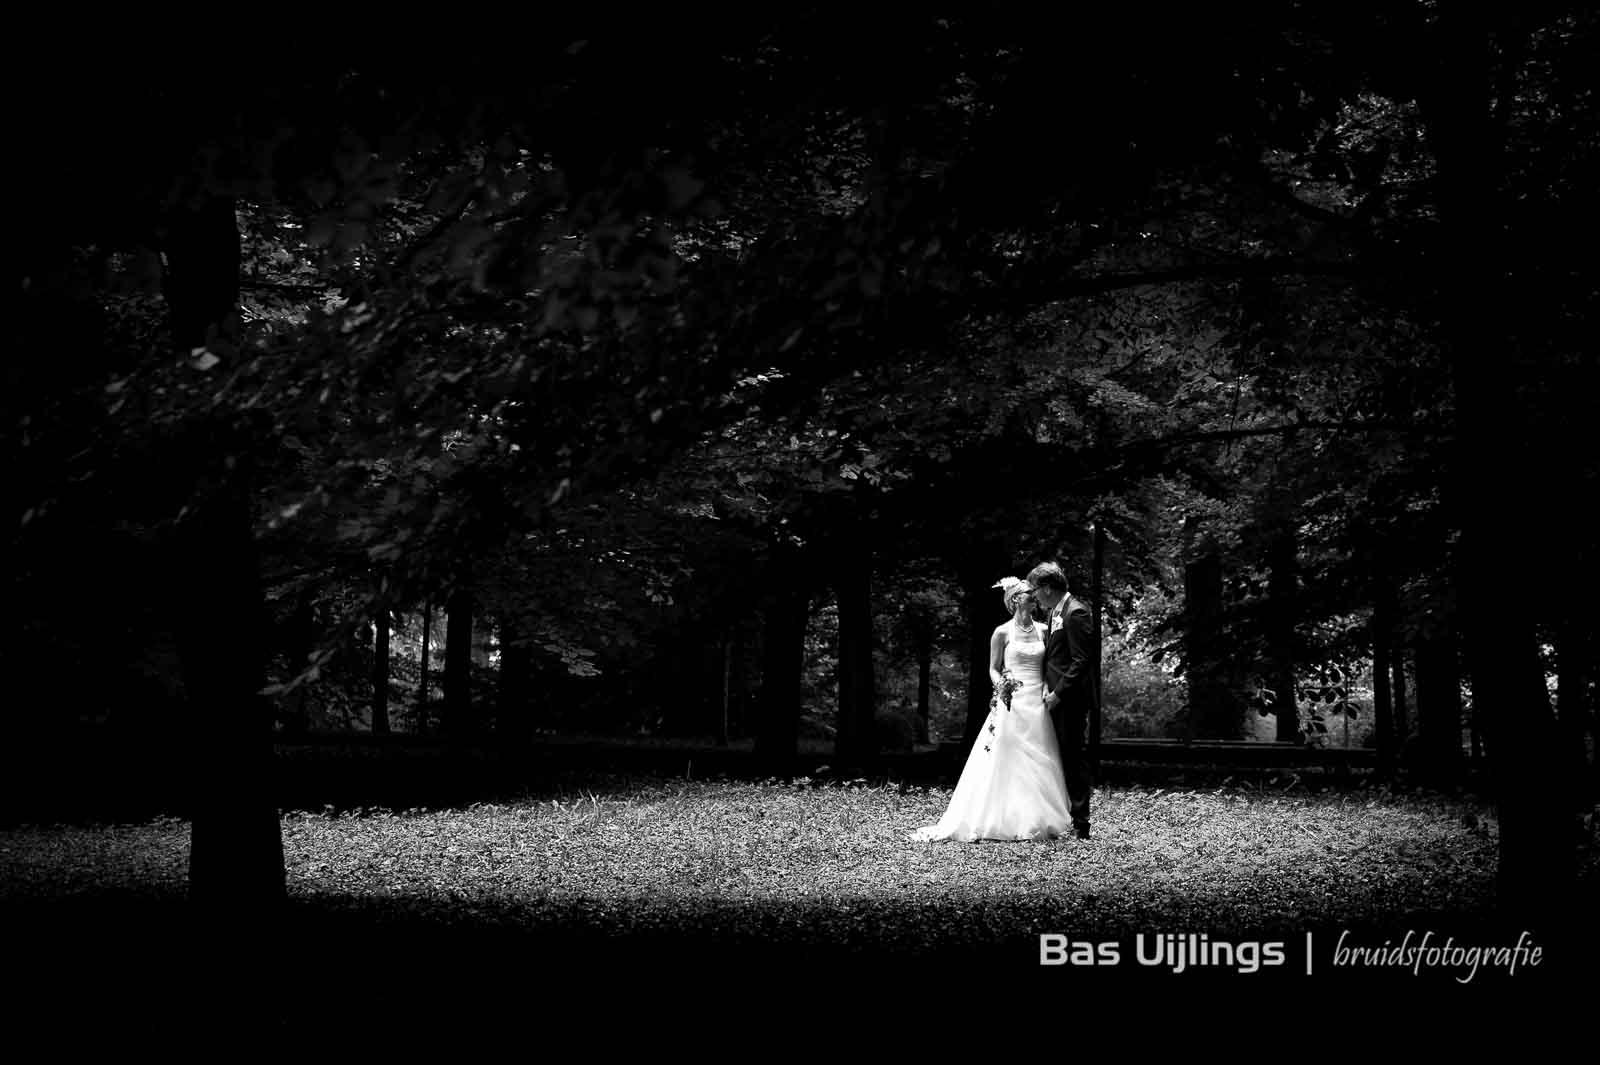 bruidsfotografie in bos